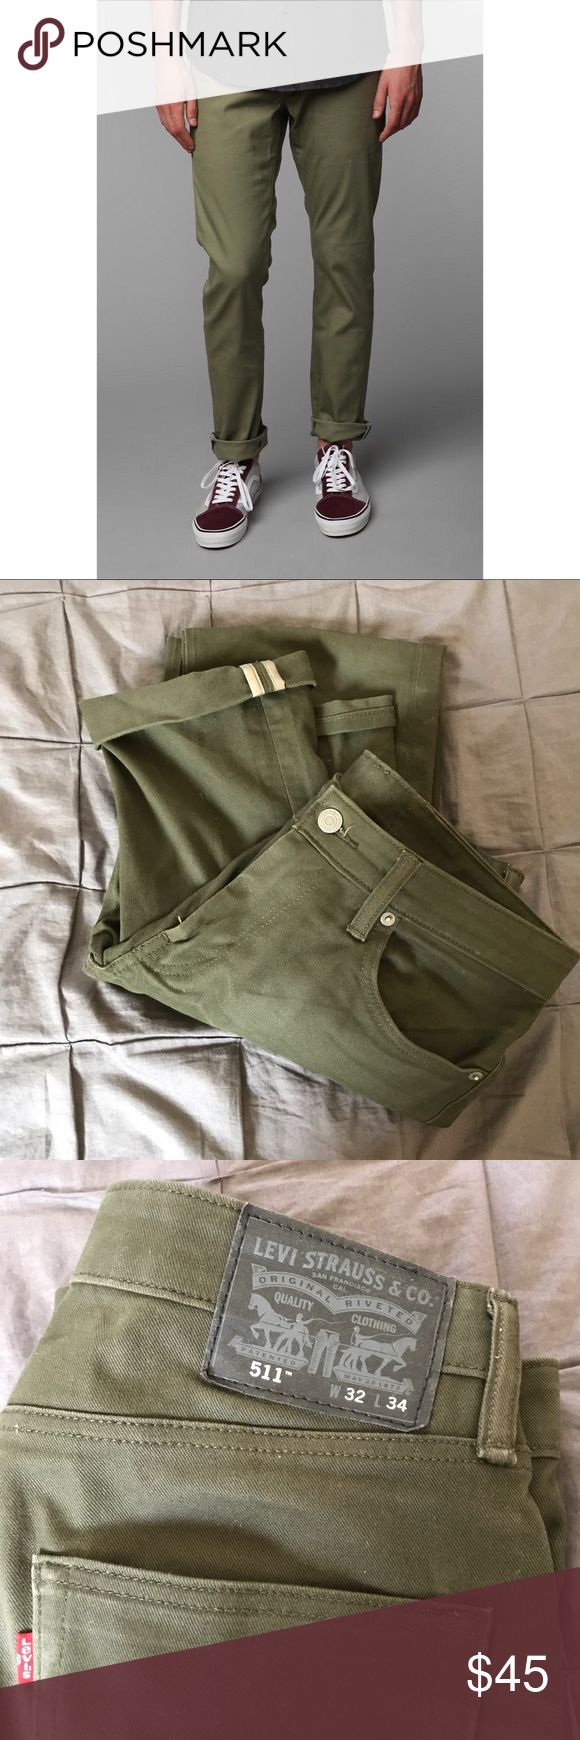 Men's 511 Levi Jeans - Olive Green EUC! Size 32 x 34. 511 Levi jeans Levi's Jeans Slim